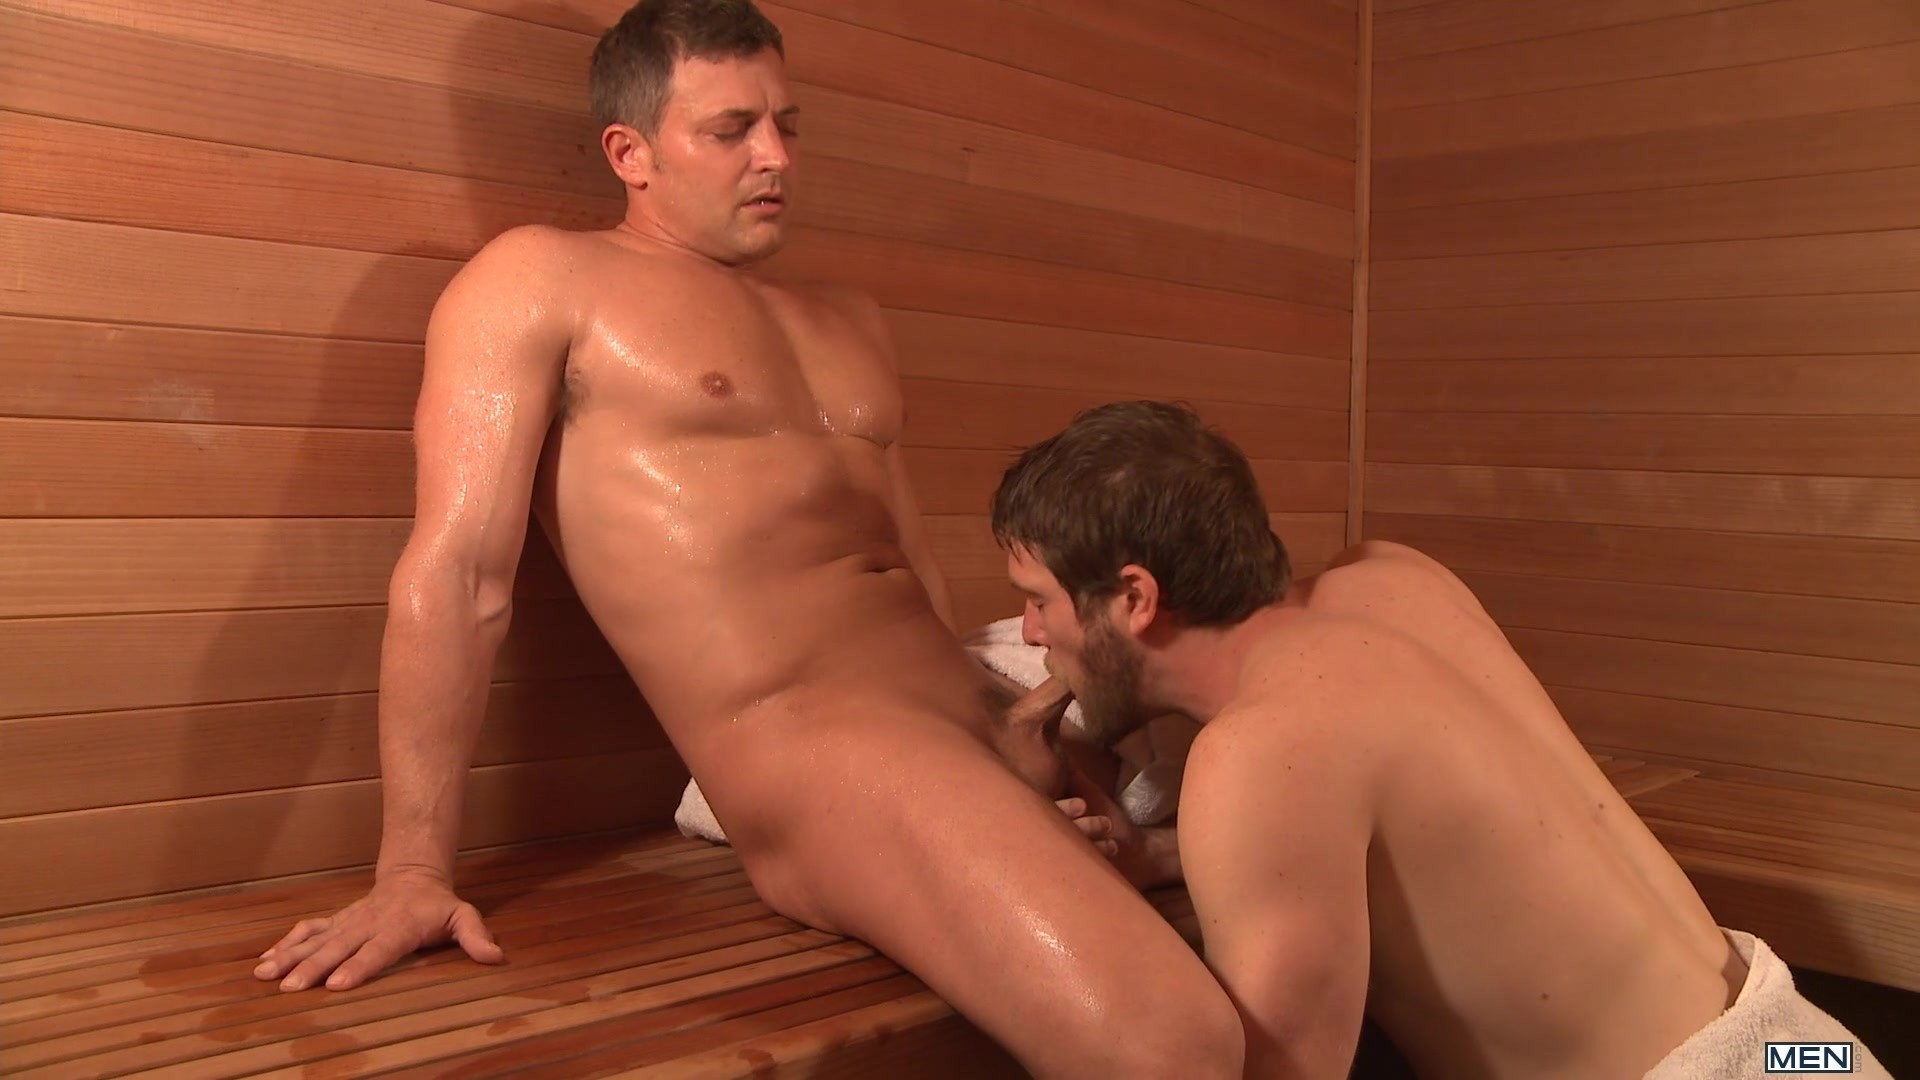 парни трахают друг друга в сауне фото все еще насаженная